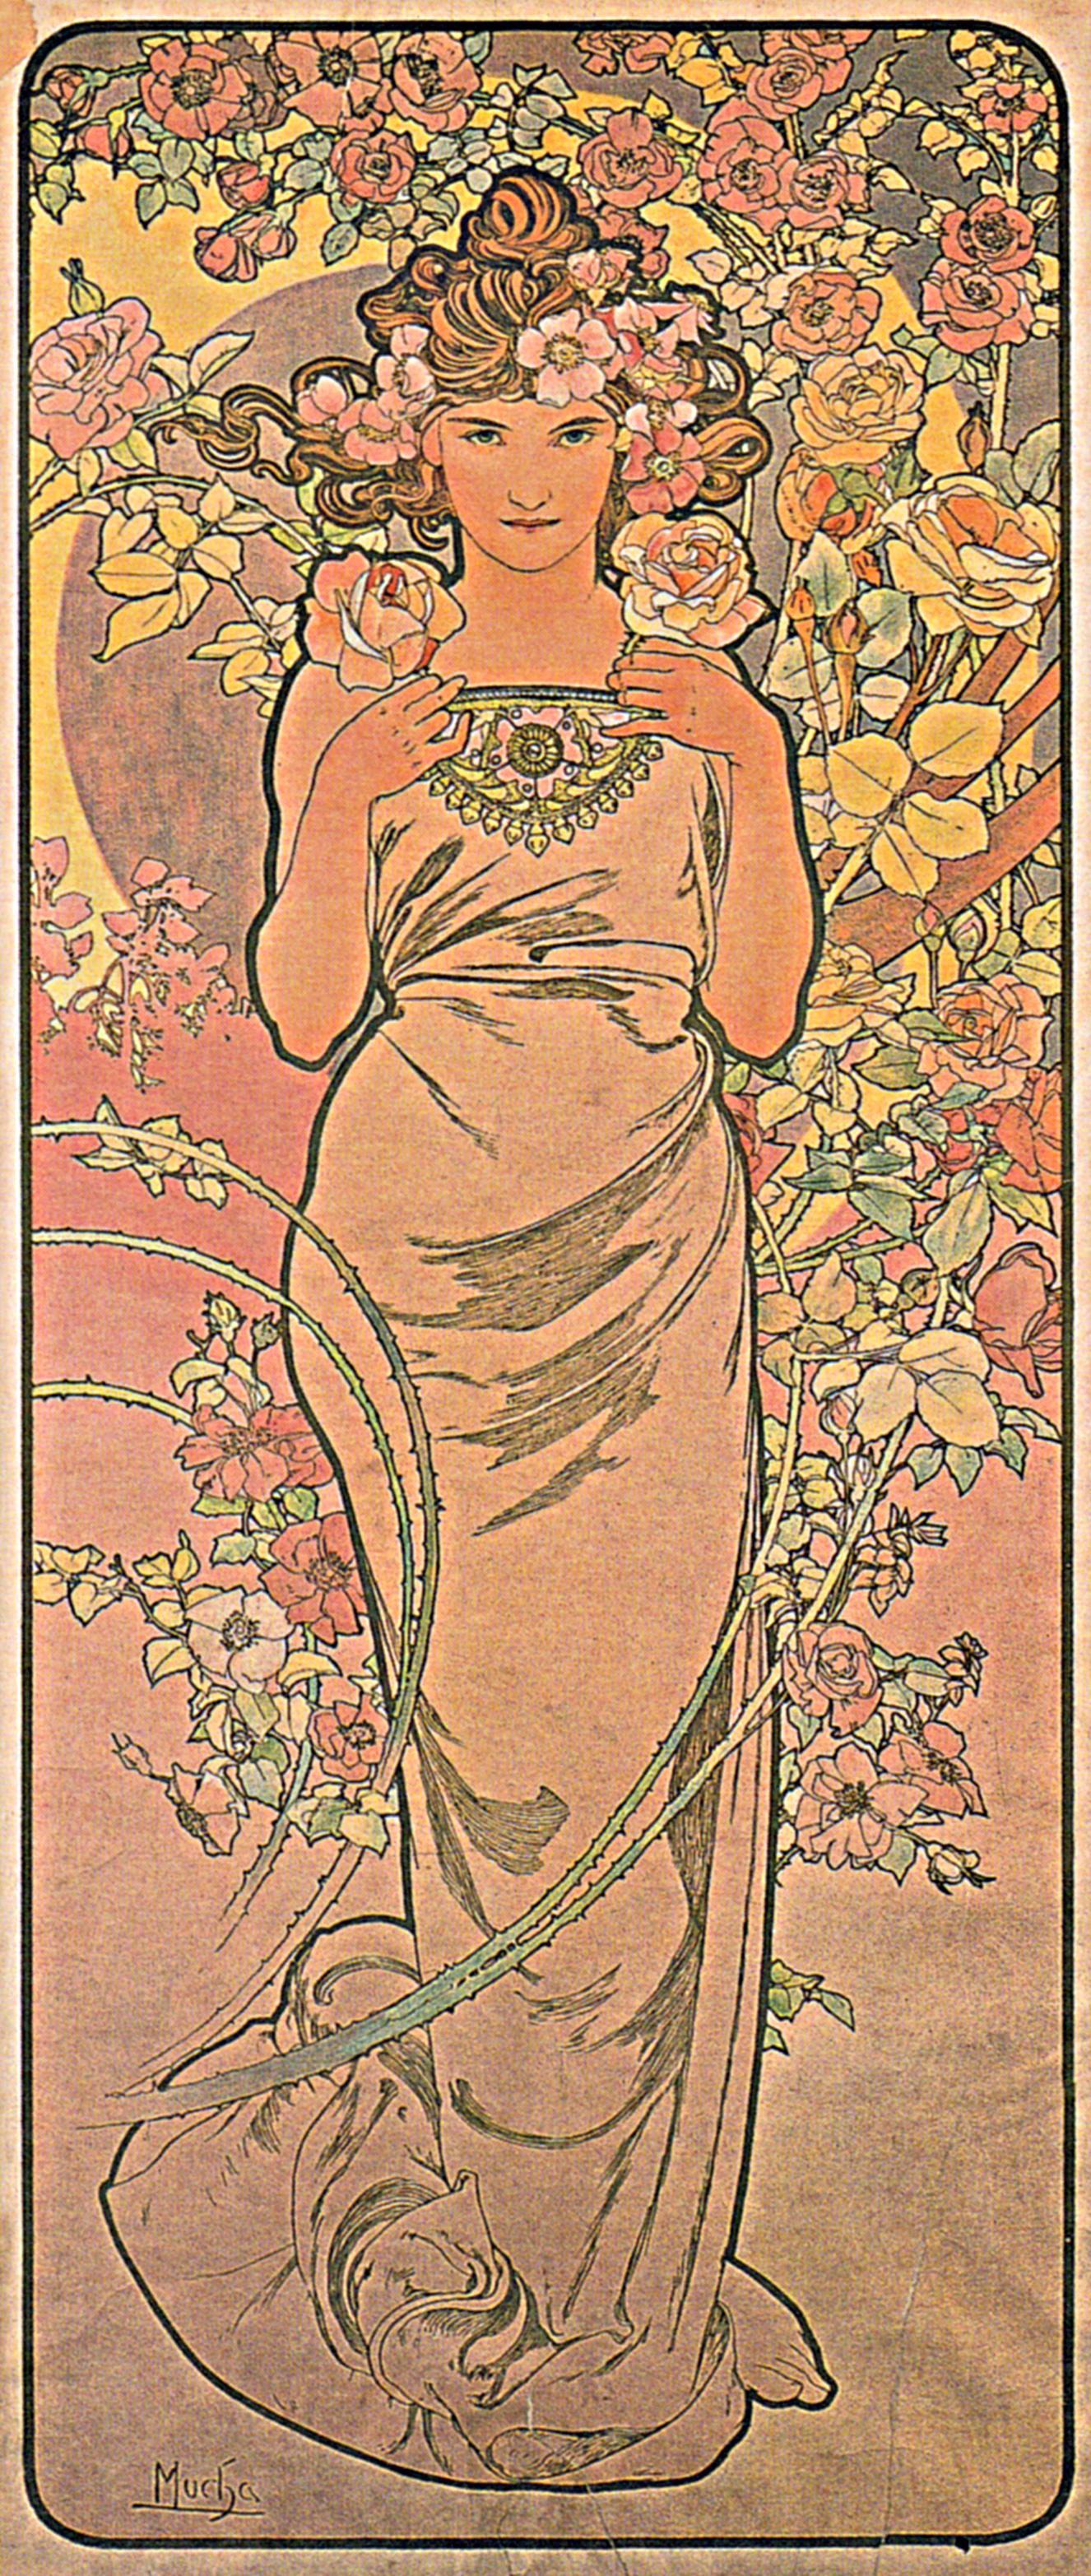 http://upload.wikimedia.org/wikipedia/commons/1/11/Alfons_Mucha_-_Die_Rose_-_1898.jpeg